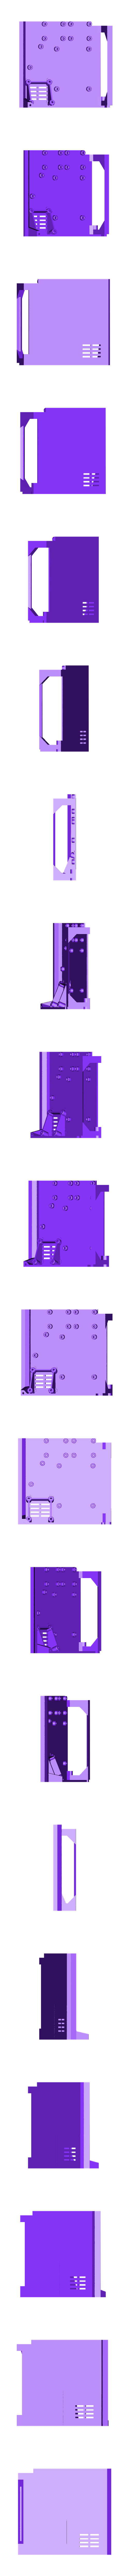 TeachingTech_SKR_1.3_D3_Left_Fan.stl Download free STL file Vertical Fan Duct Universal Rear Electronics Case for Ender 3 • 3D printing object, D3Dorsett